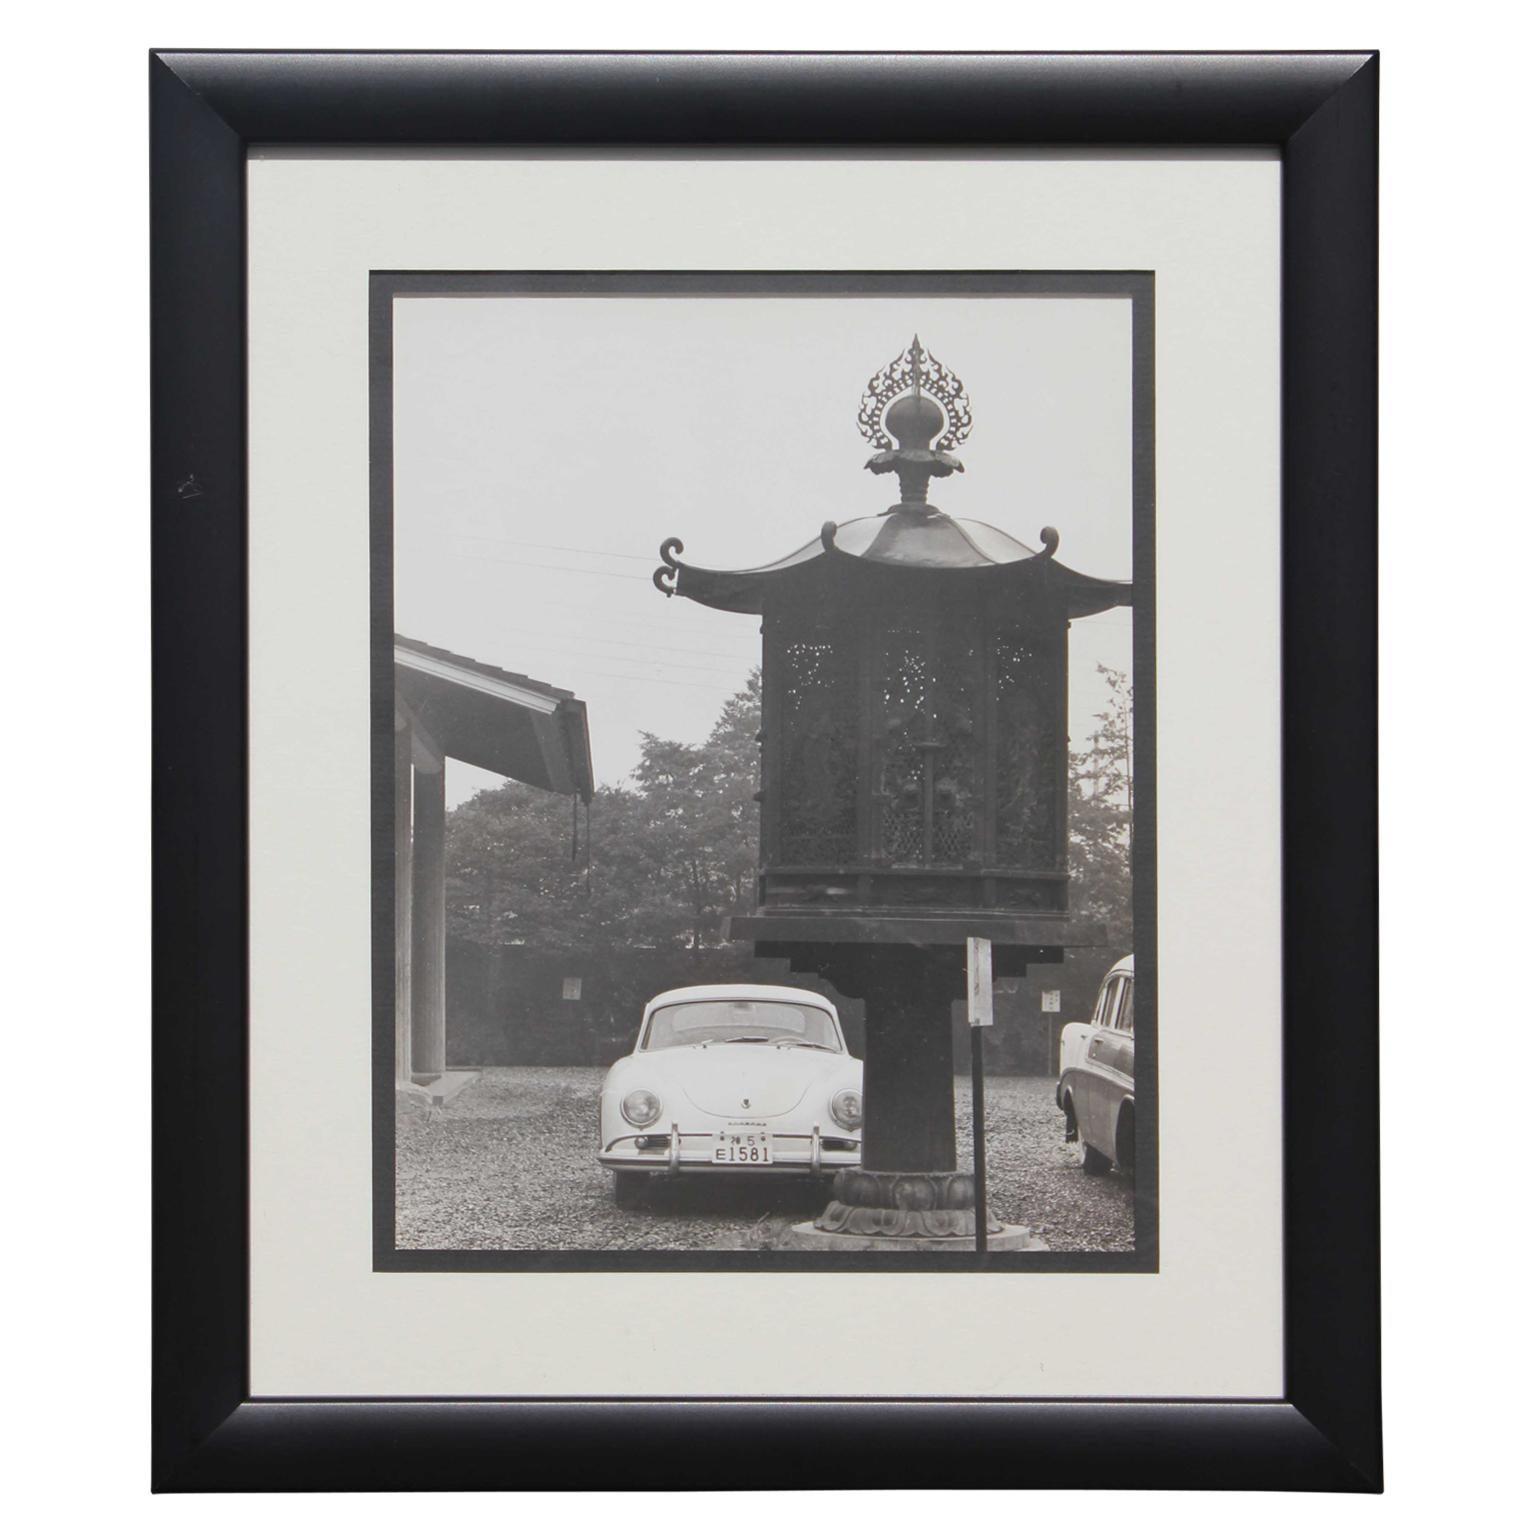 Black and White Japanese Porsche and Lantern Photograph